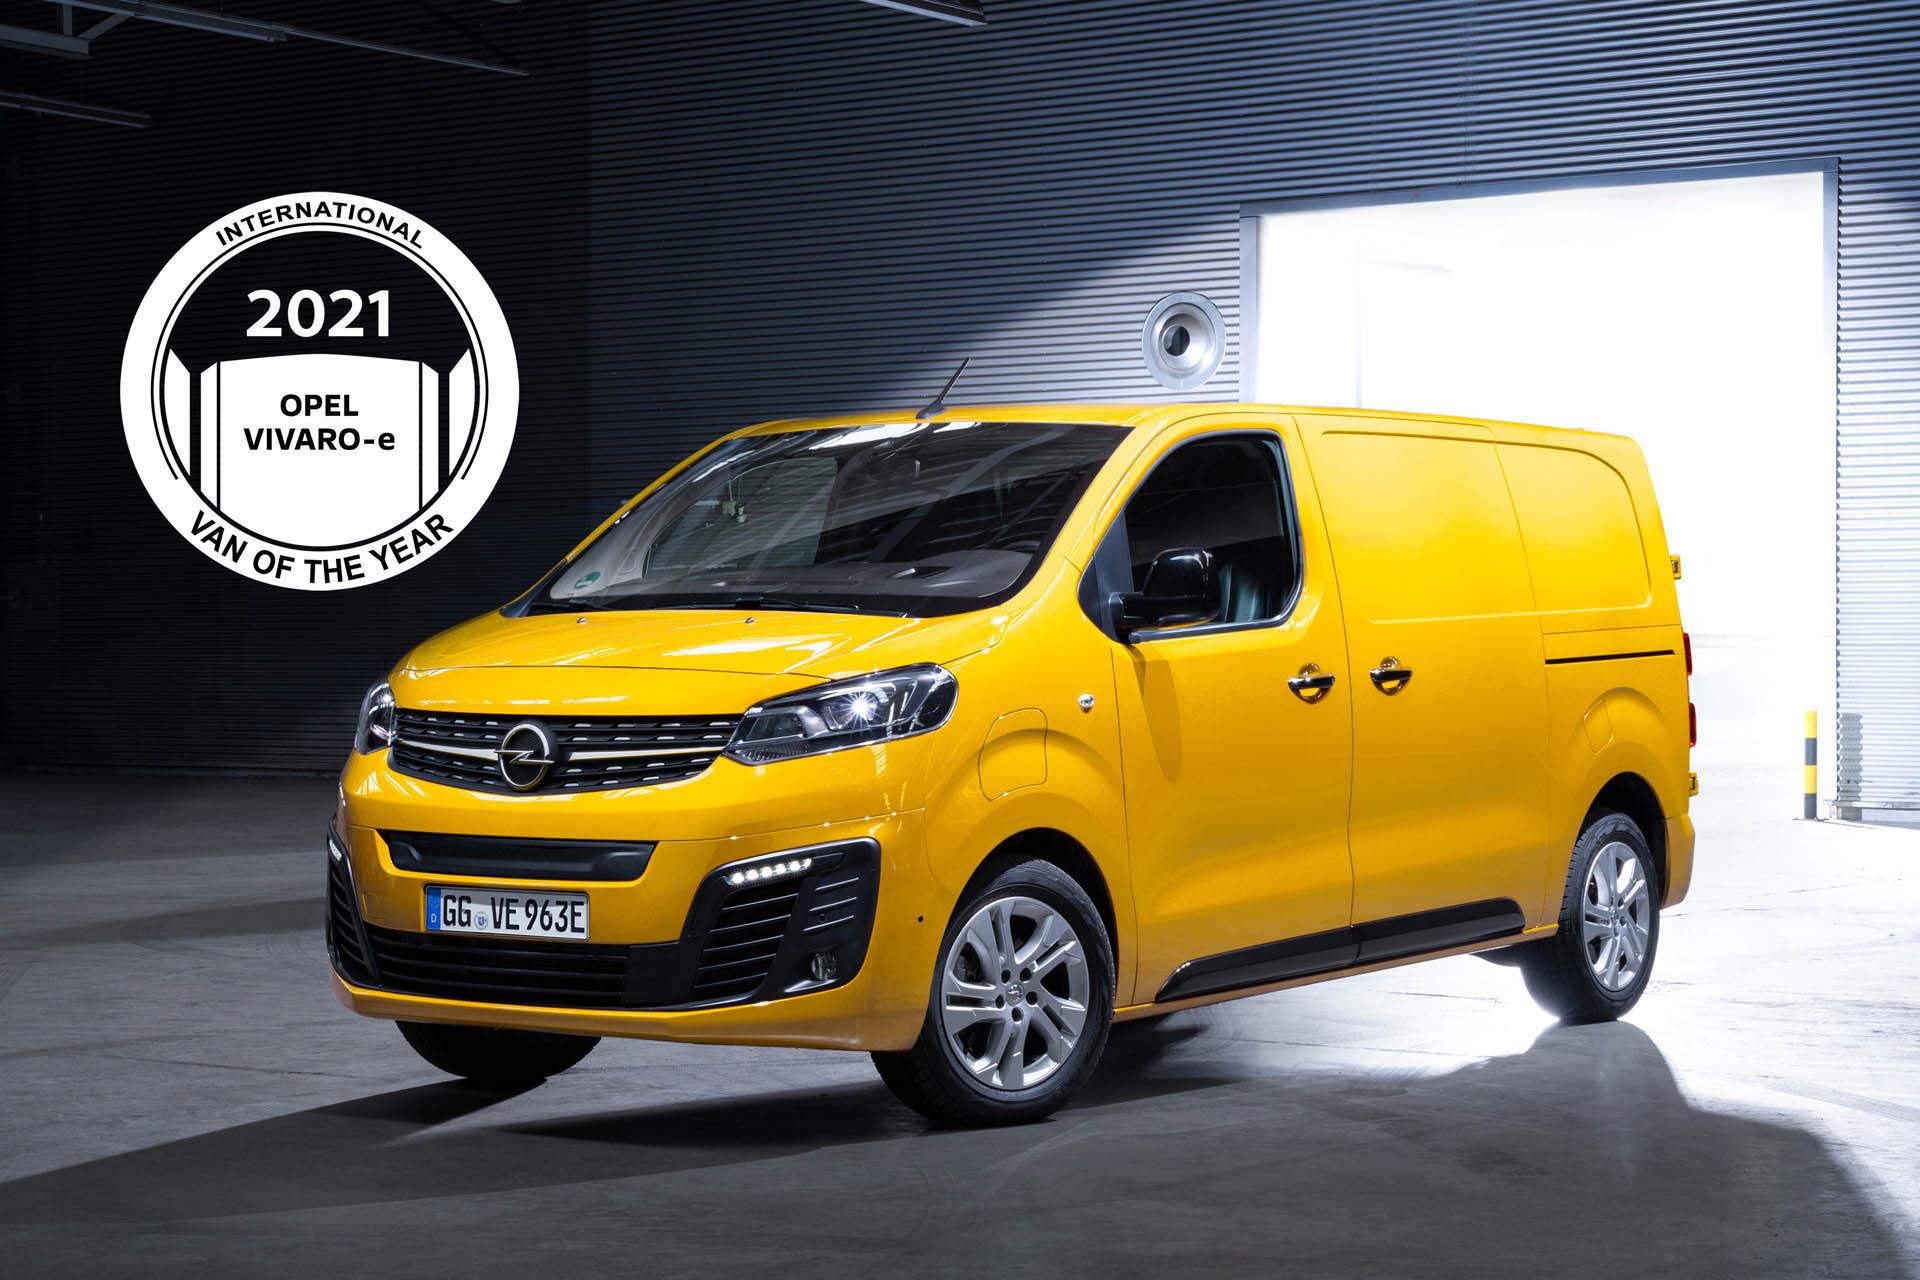 Opel, Peugeot, Citroën